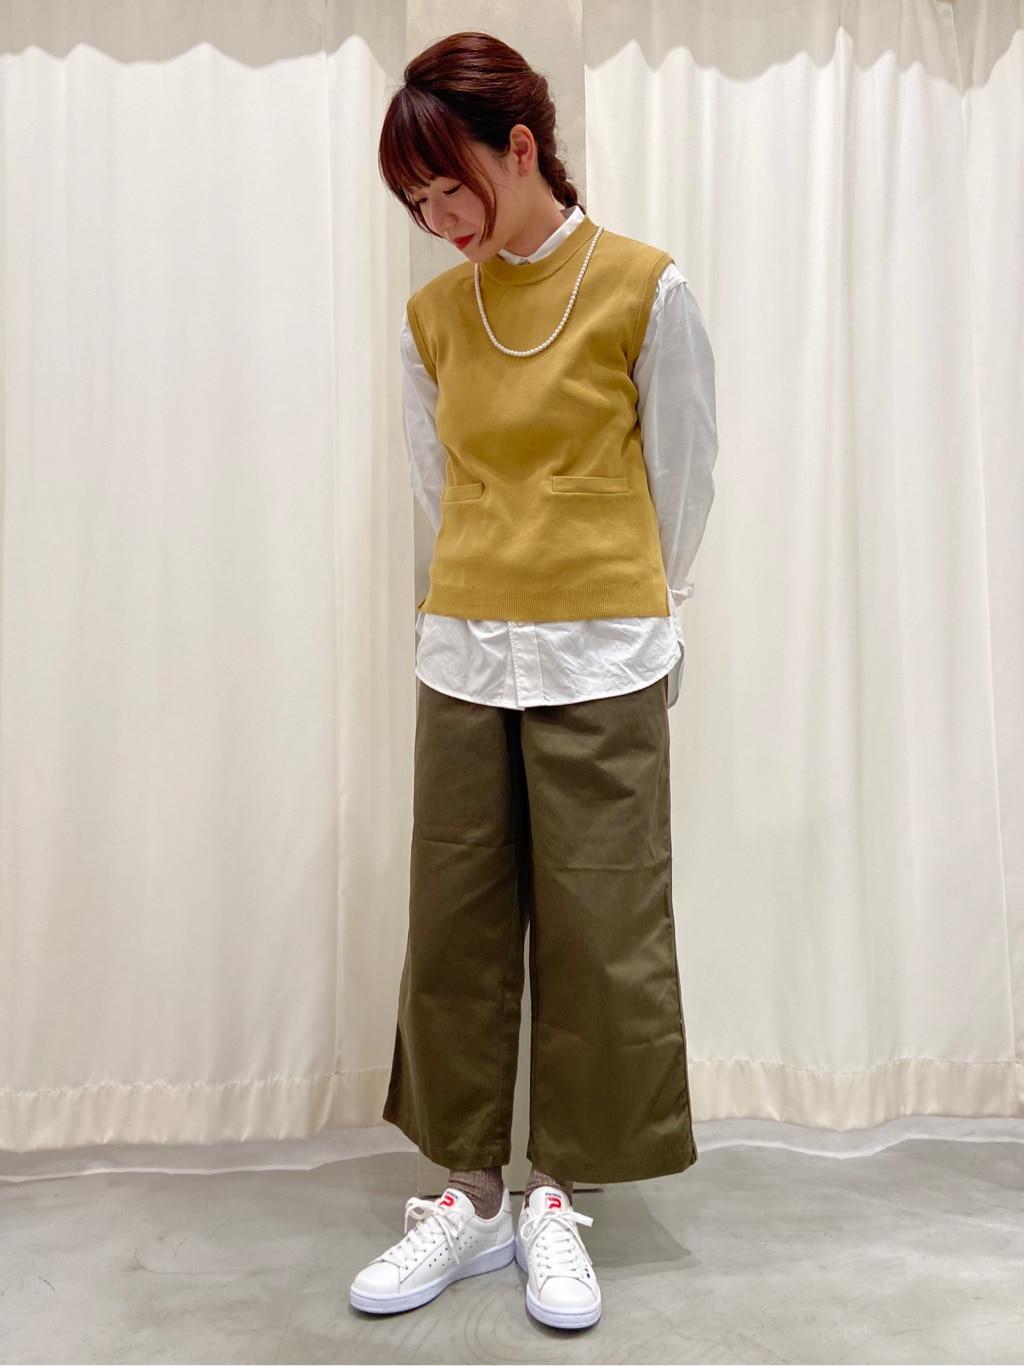 - CHILD WOMAN CHILD WOMAN , PAR ICI 東京スカイツリータウン・ソラマチ 身長:165cm 2021.02.06